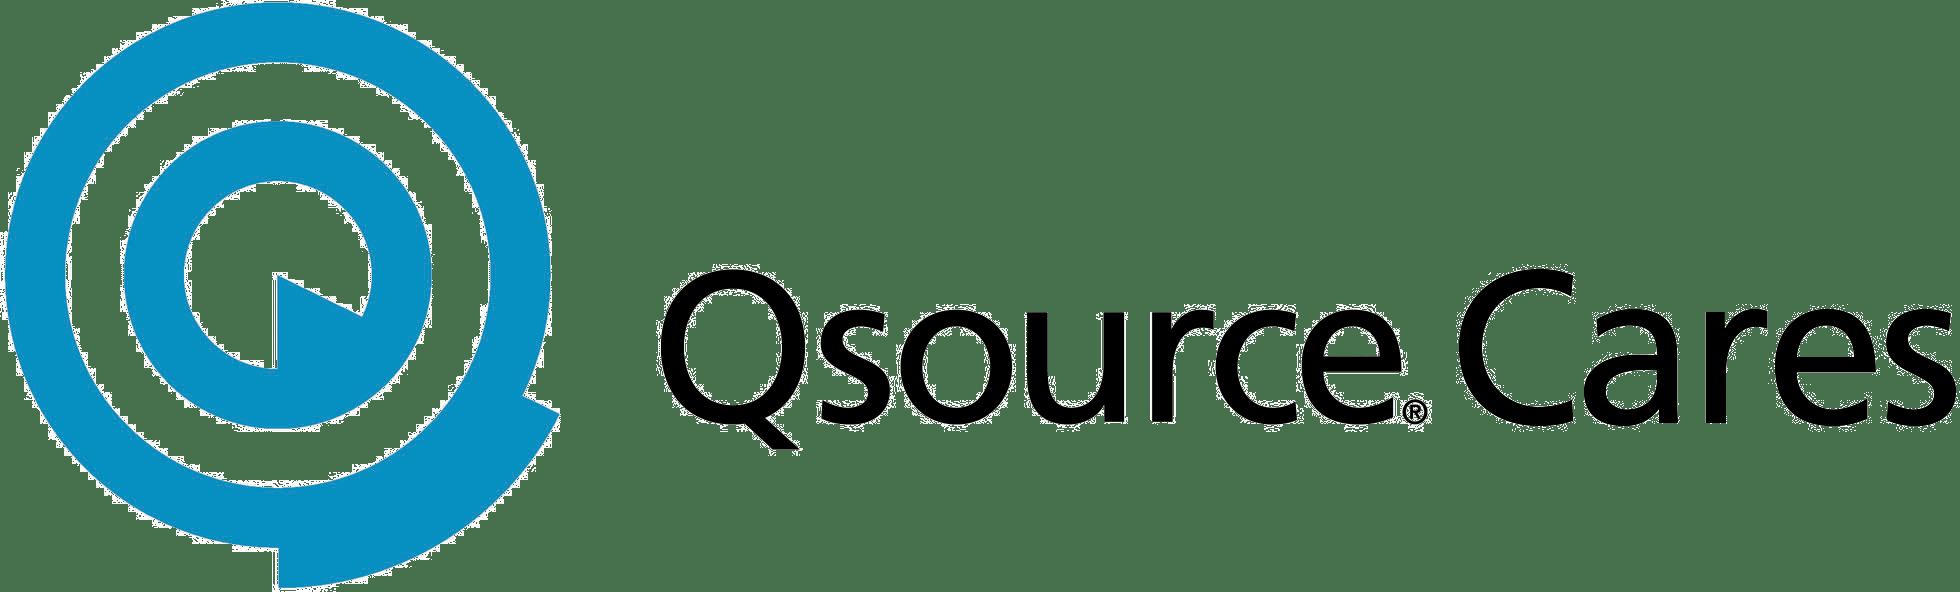 Qsource Cares Vertical